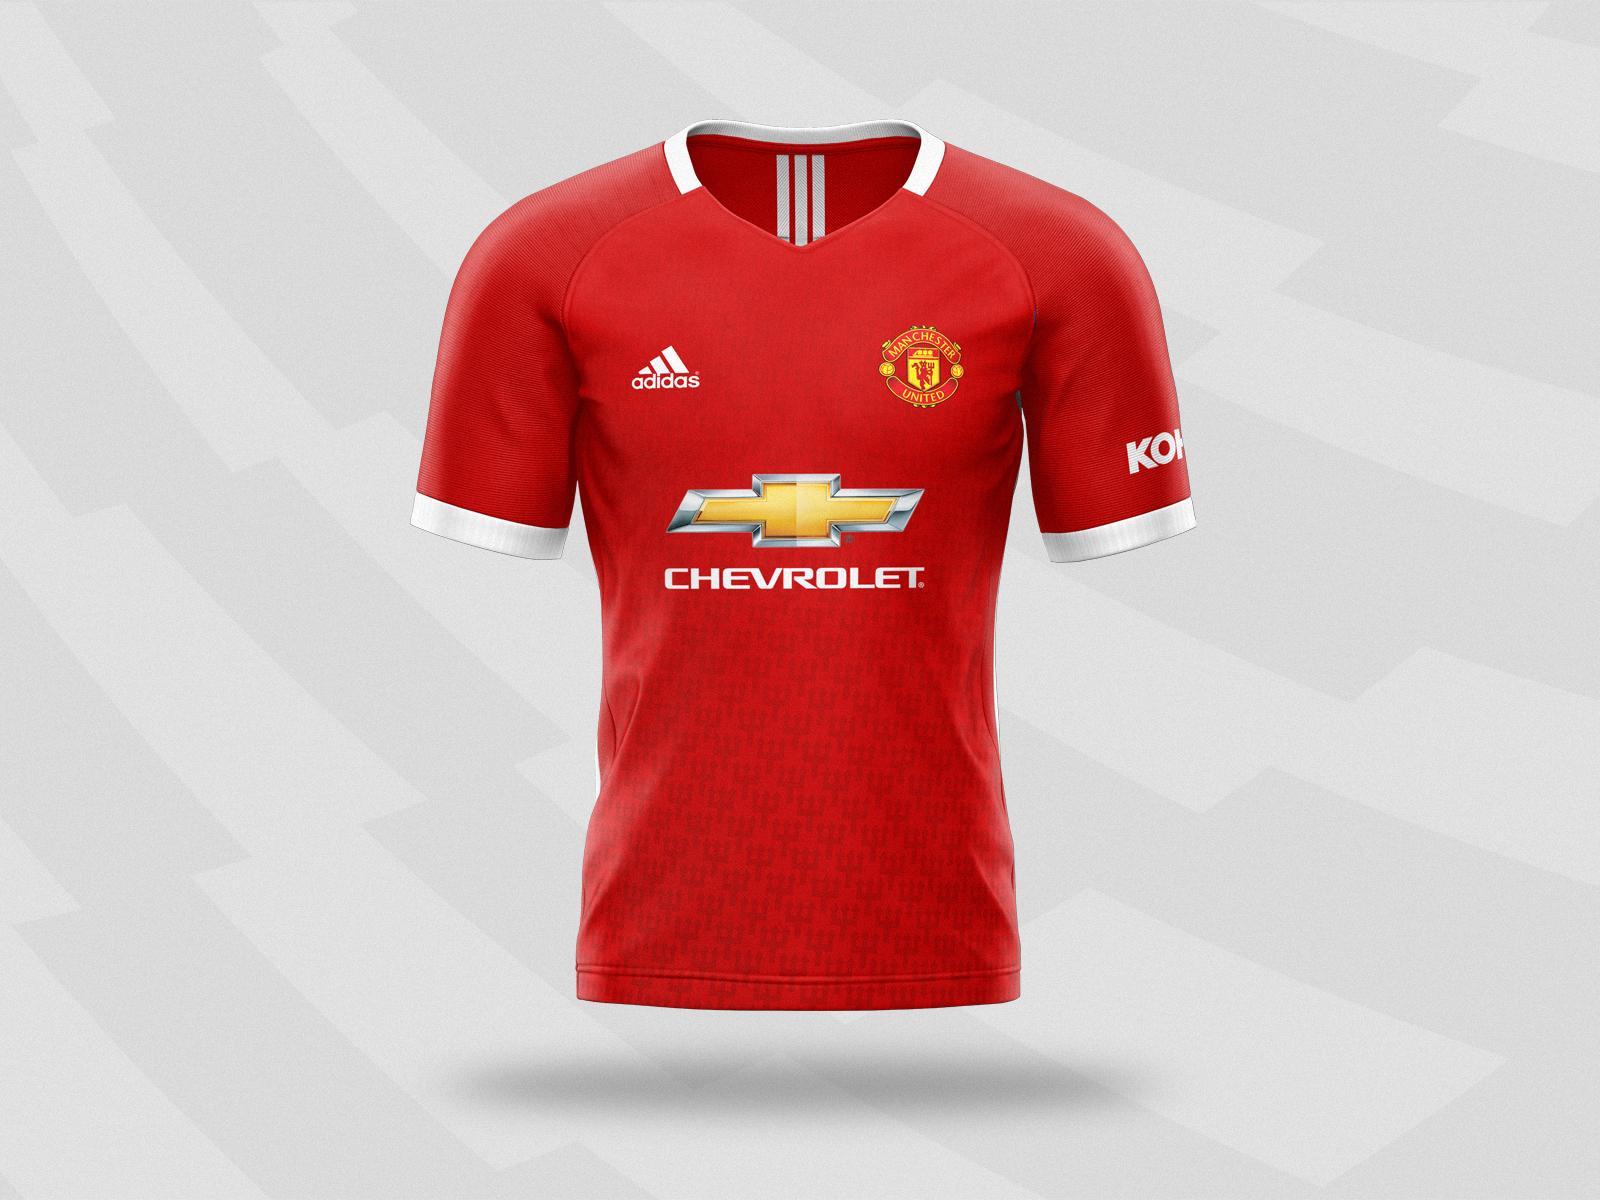 Manchester United 2020 21 Home Kit Concept Design By Maciej Zielinski On Dribbble